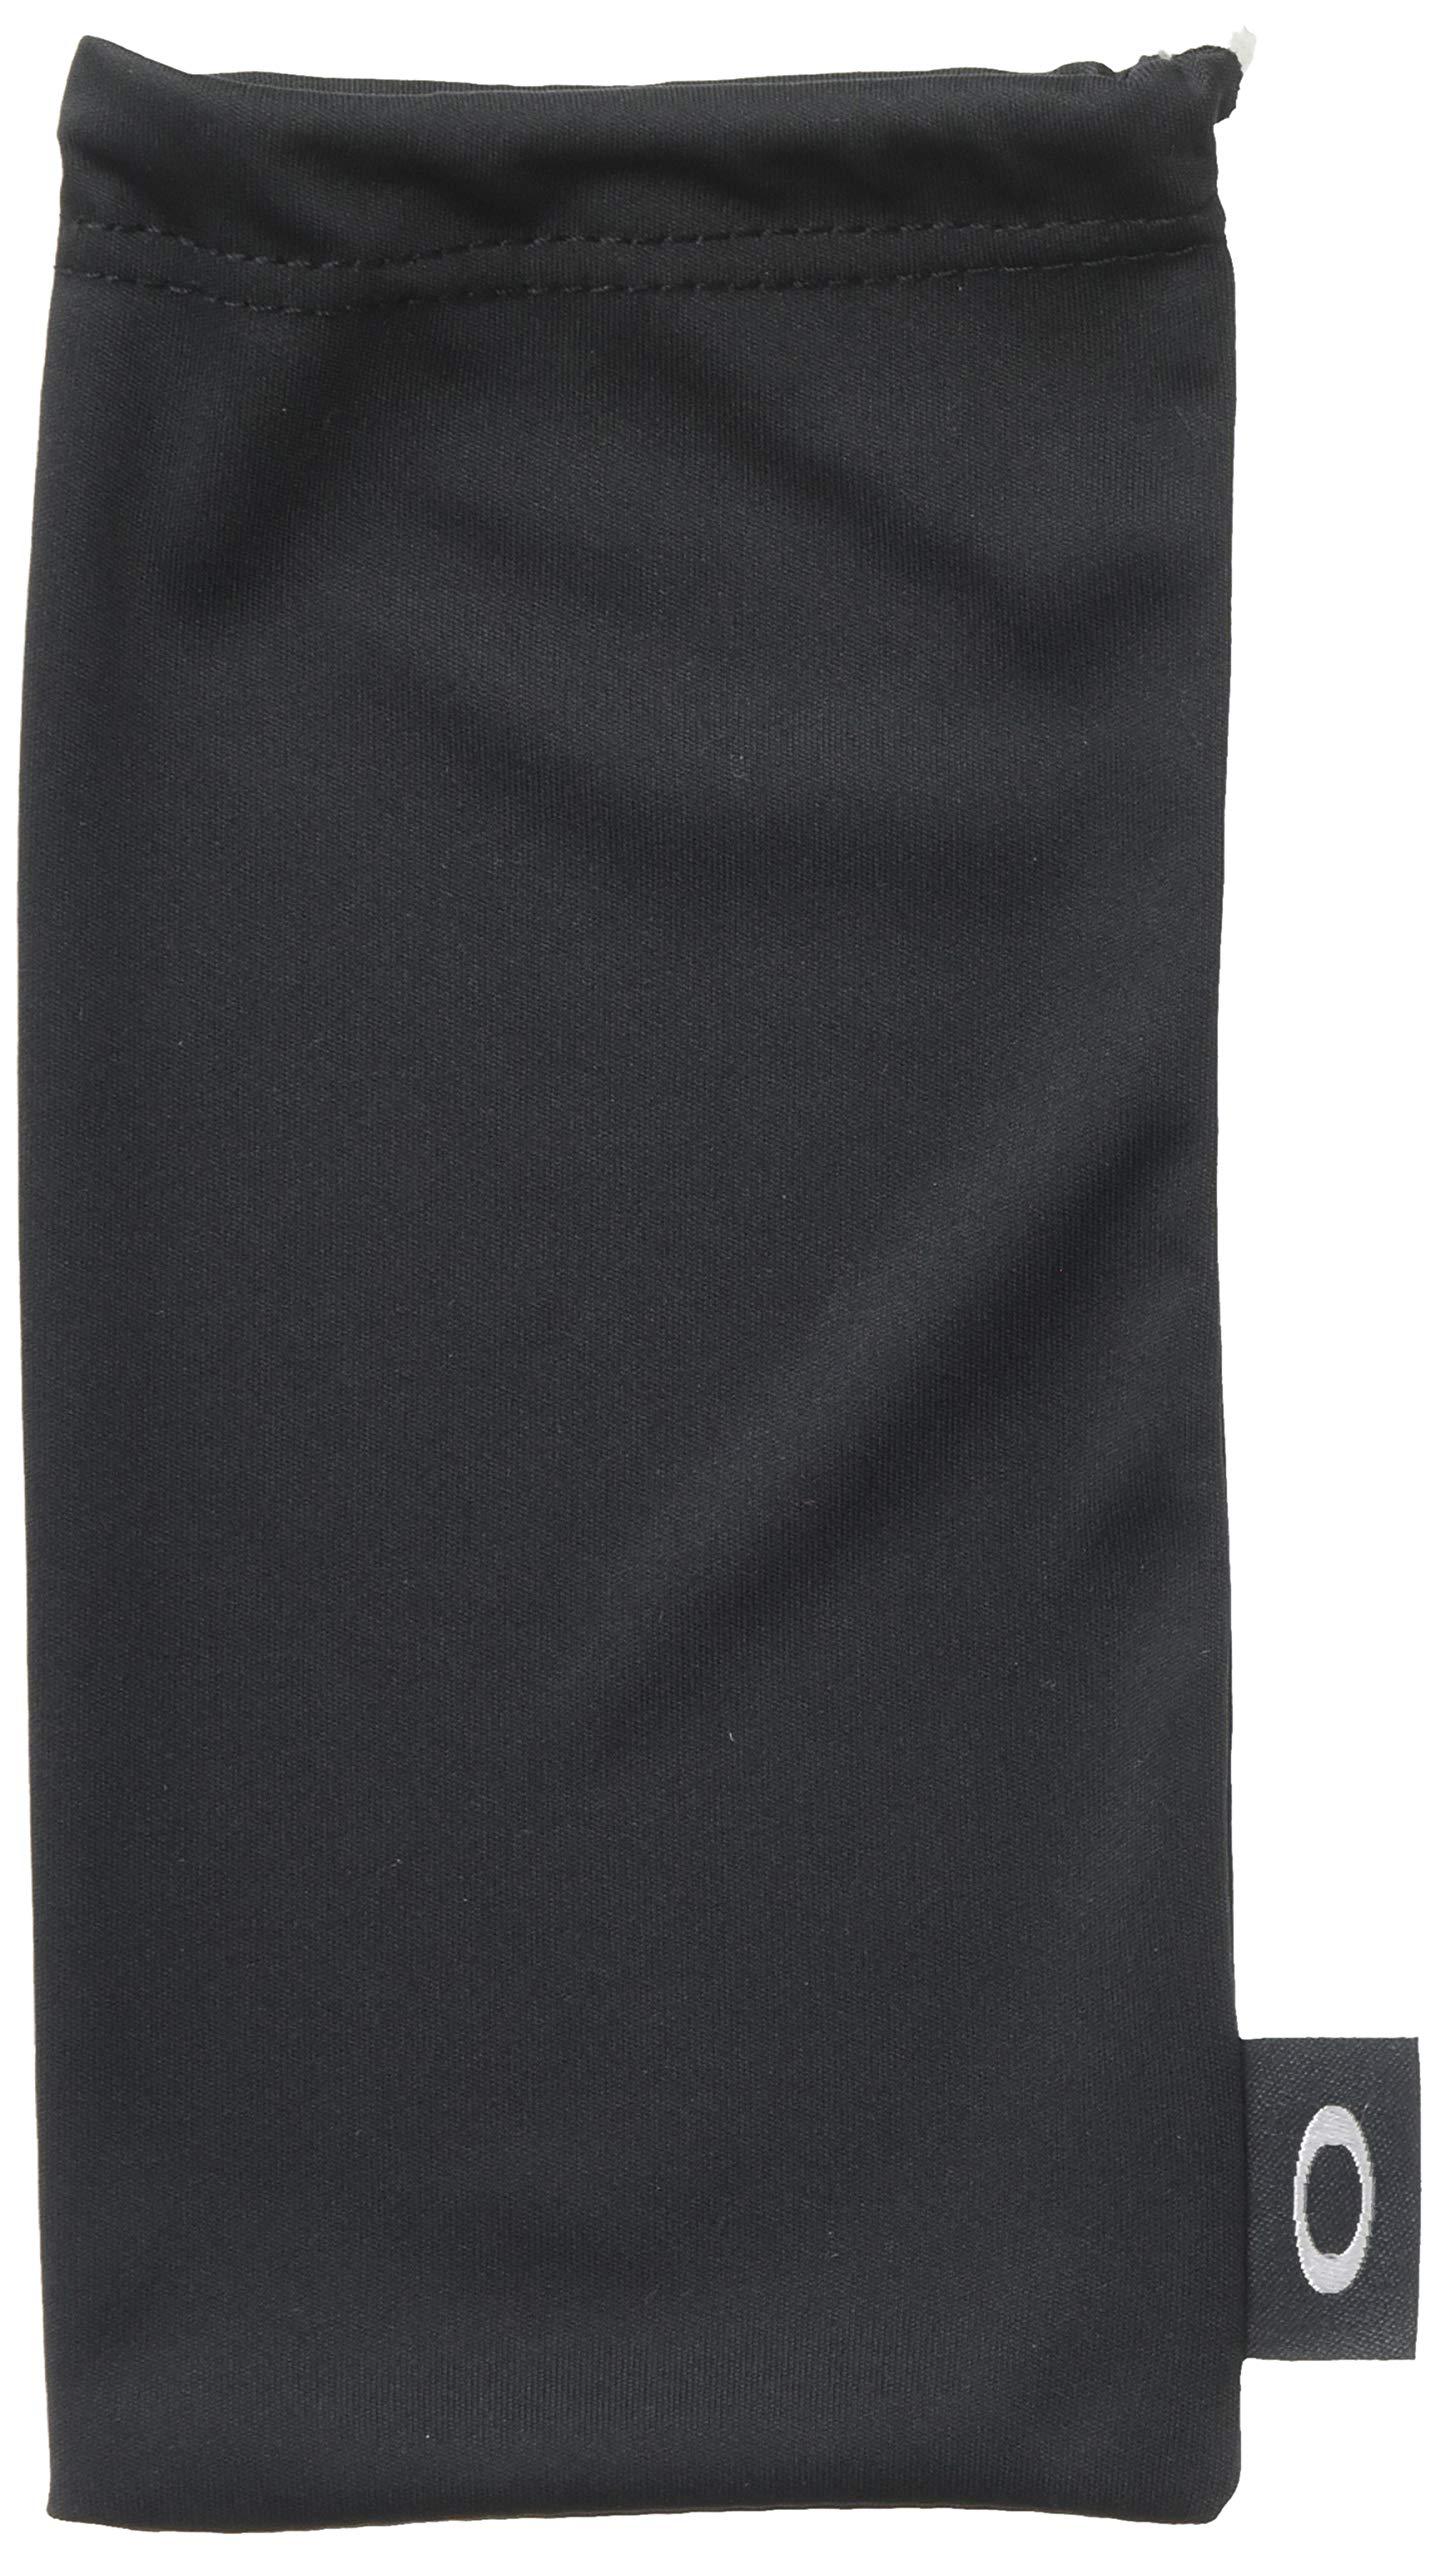 Oakley Microbag, Black, One Size